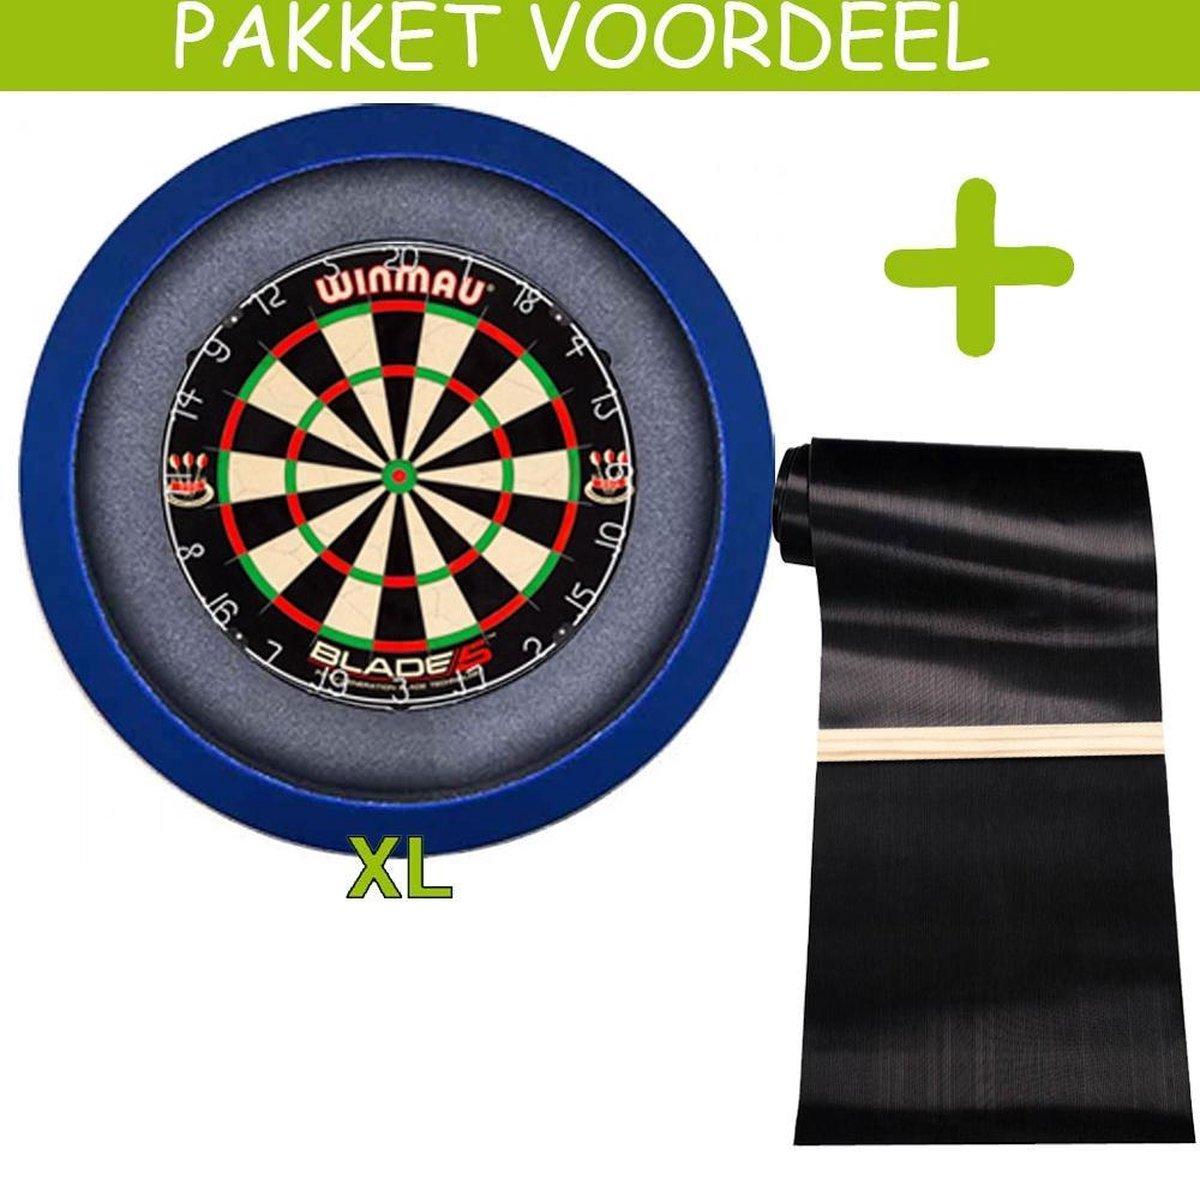 Dartbaan Pro - Blade 5 - 120 x 300 Inclusief Oche - Dartbordverlichting Basic XL - (Blauw)